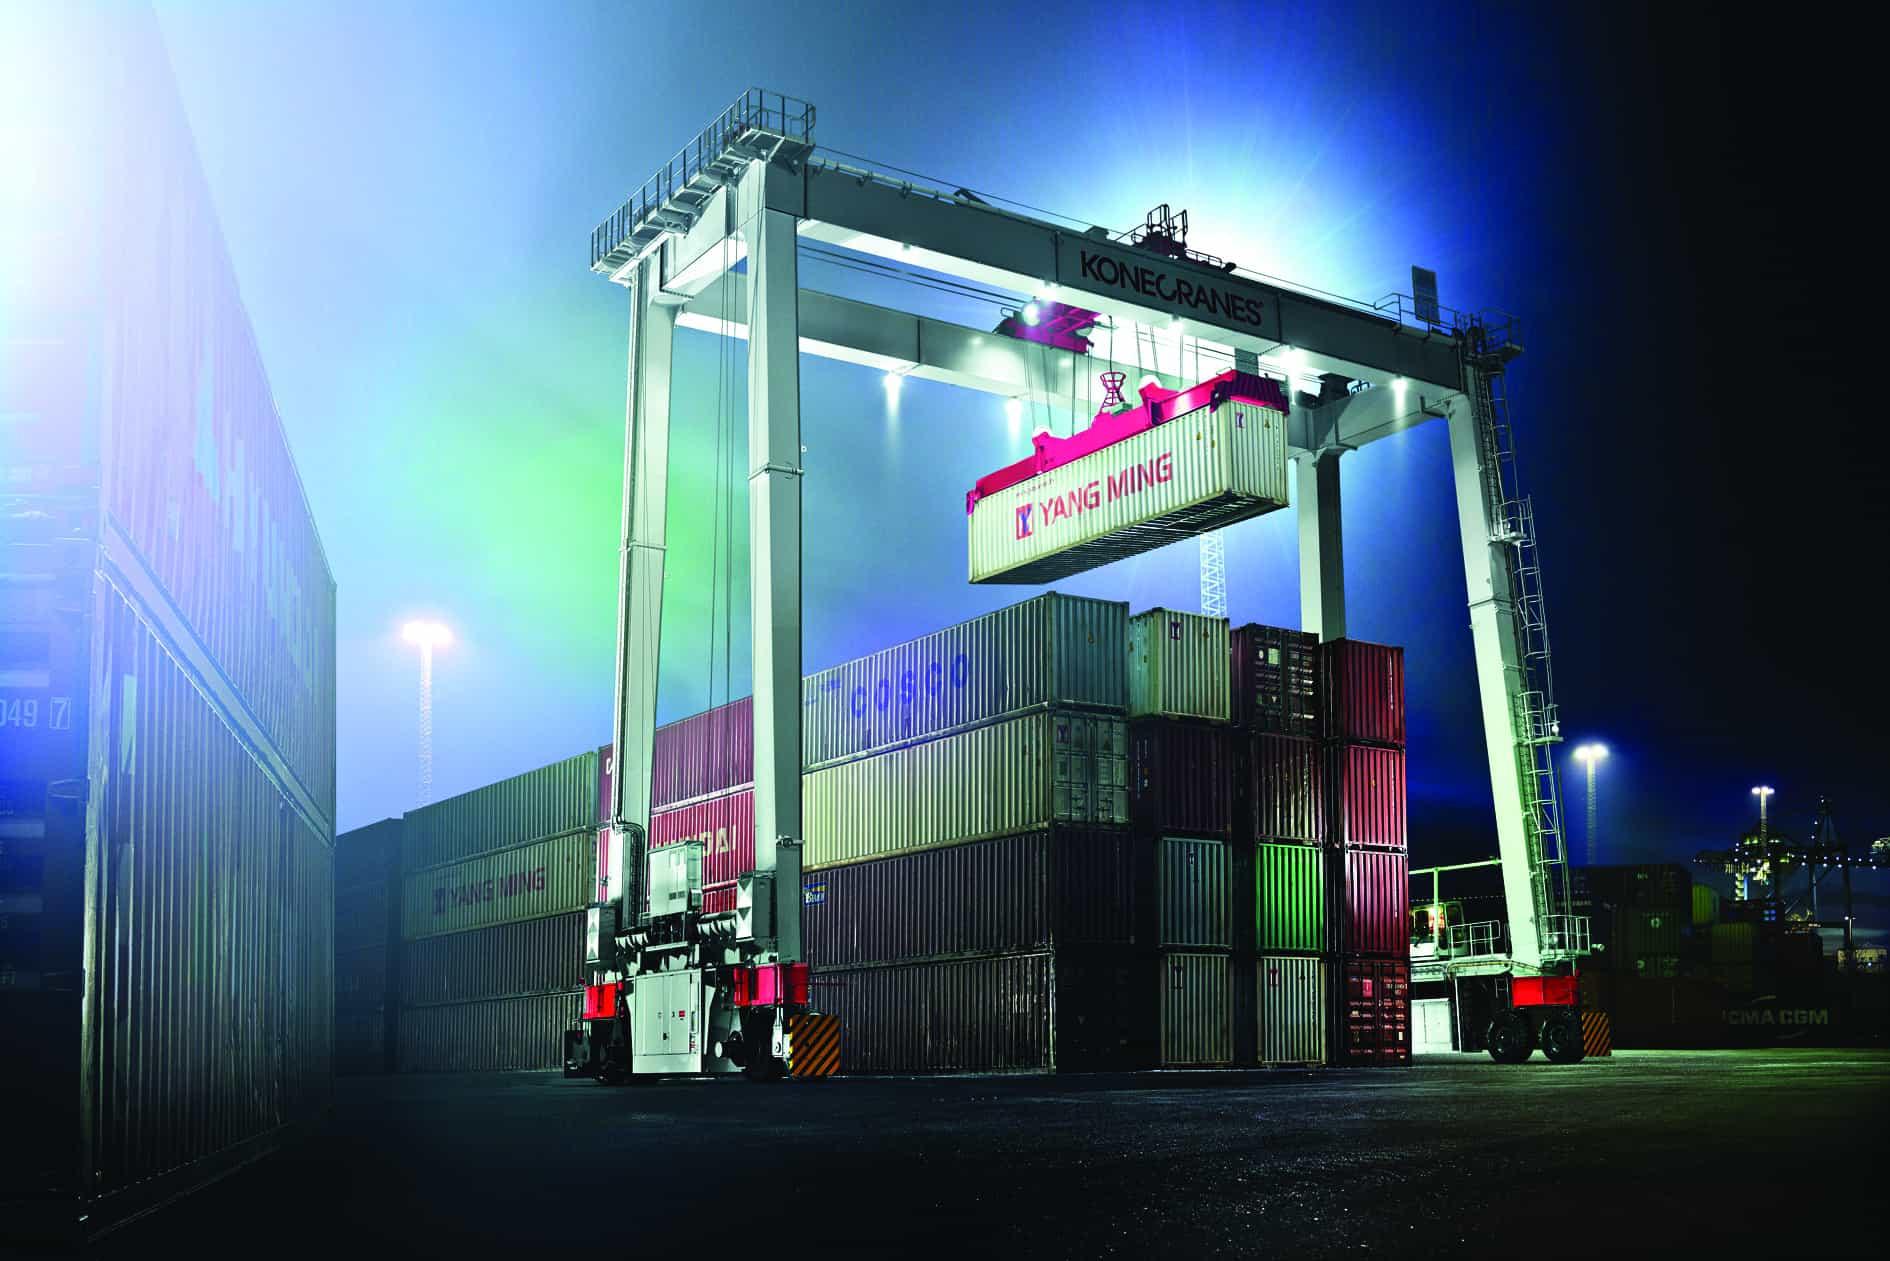 Konecranes launches revolutionary container crane